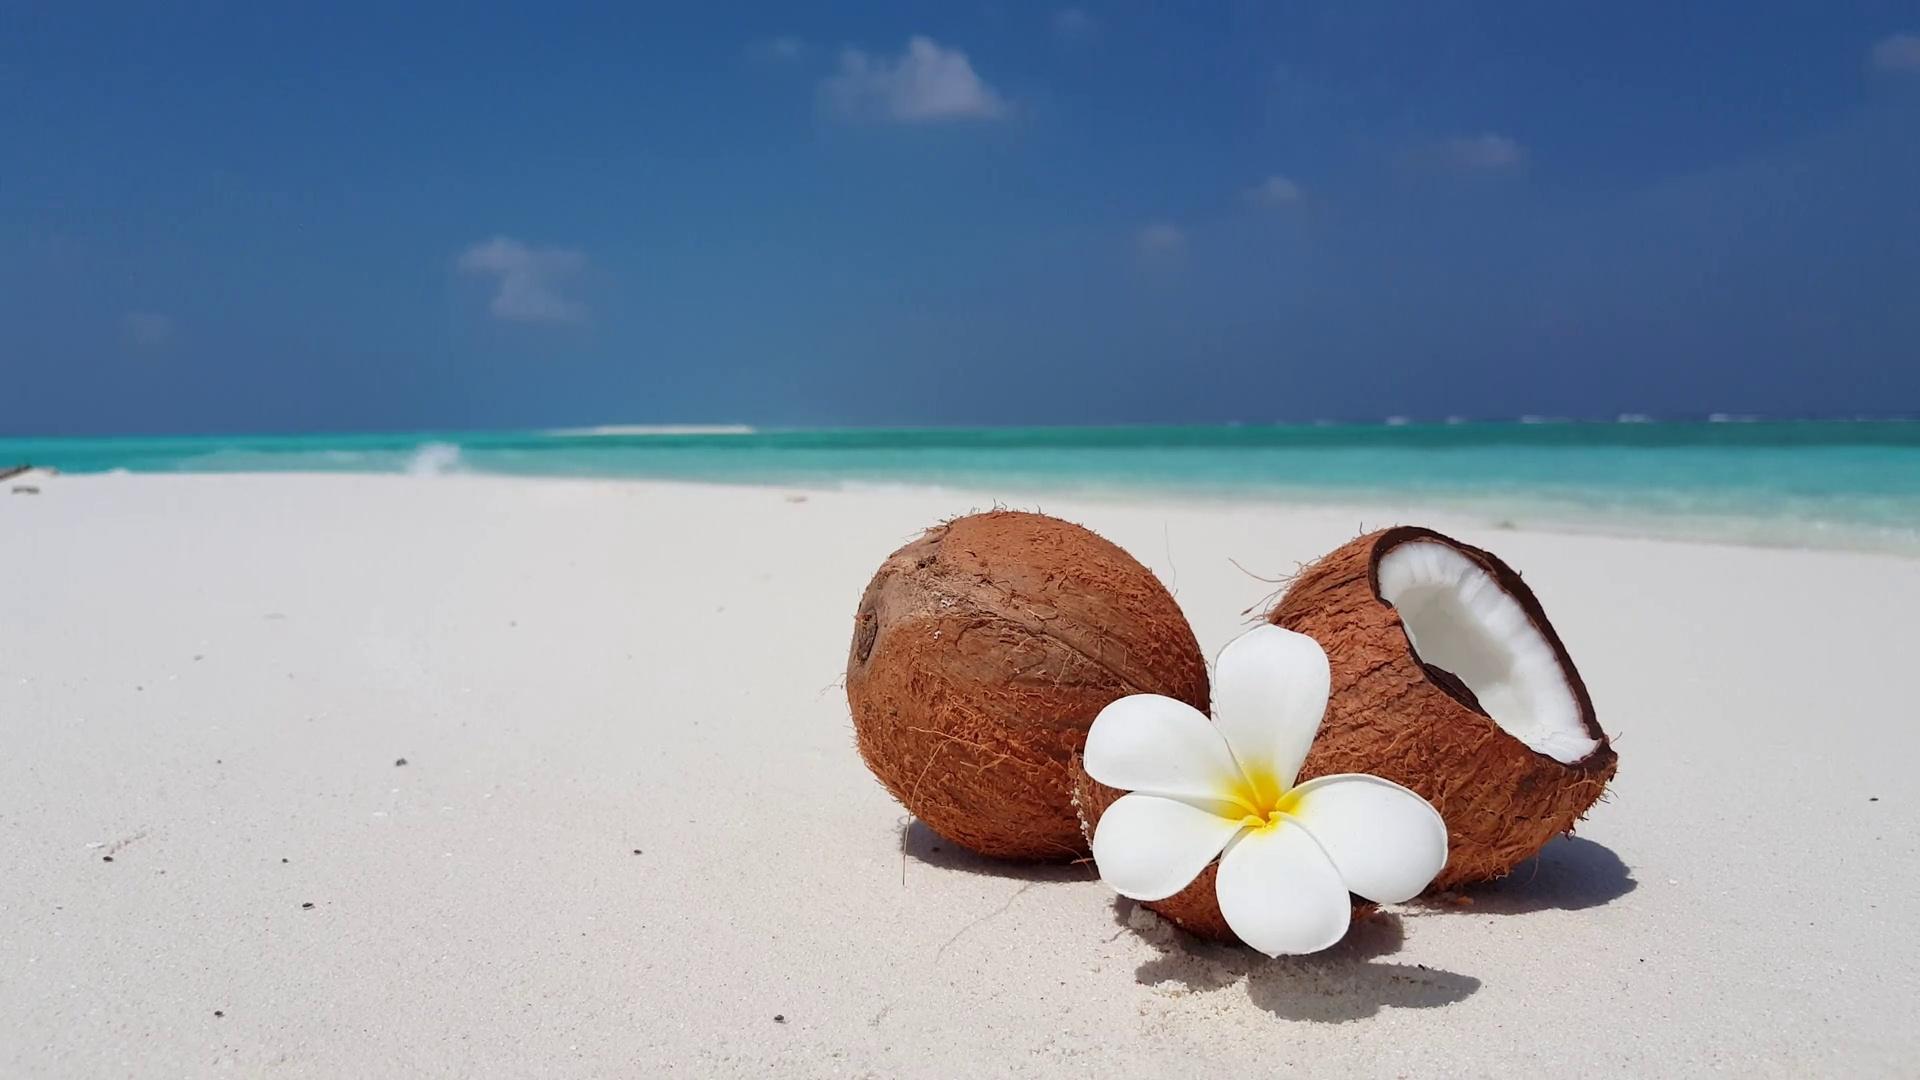 Coconuts By The Sea windows wallpaper